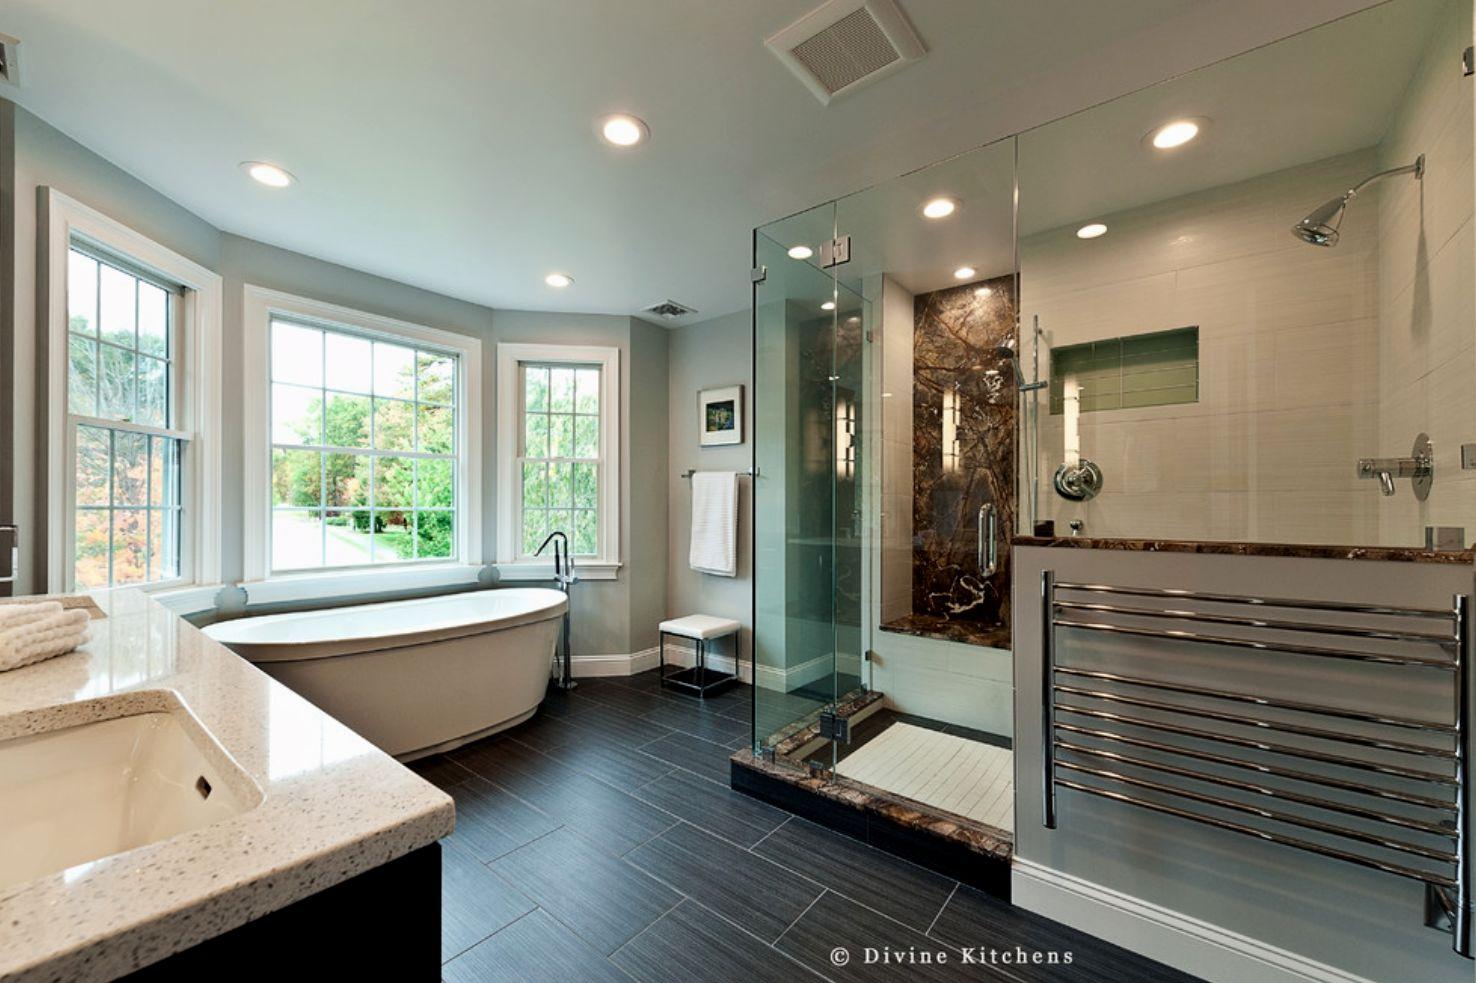 inspirational bathroom storage ideas plan-Latest Bathroom Storage Ideas Décor